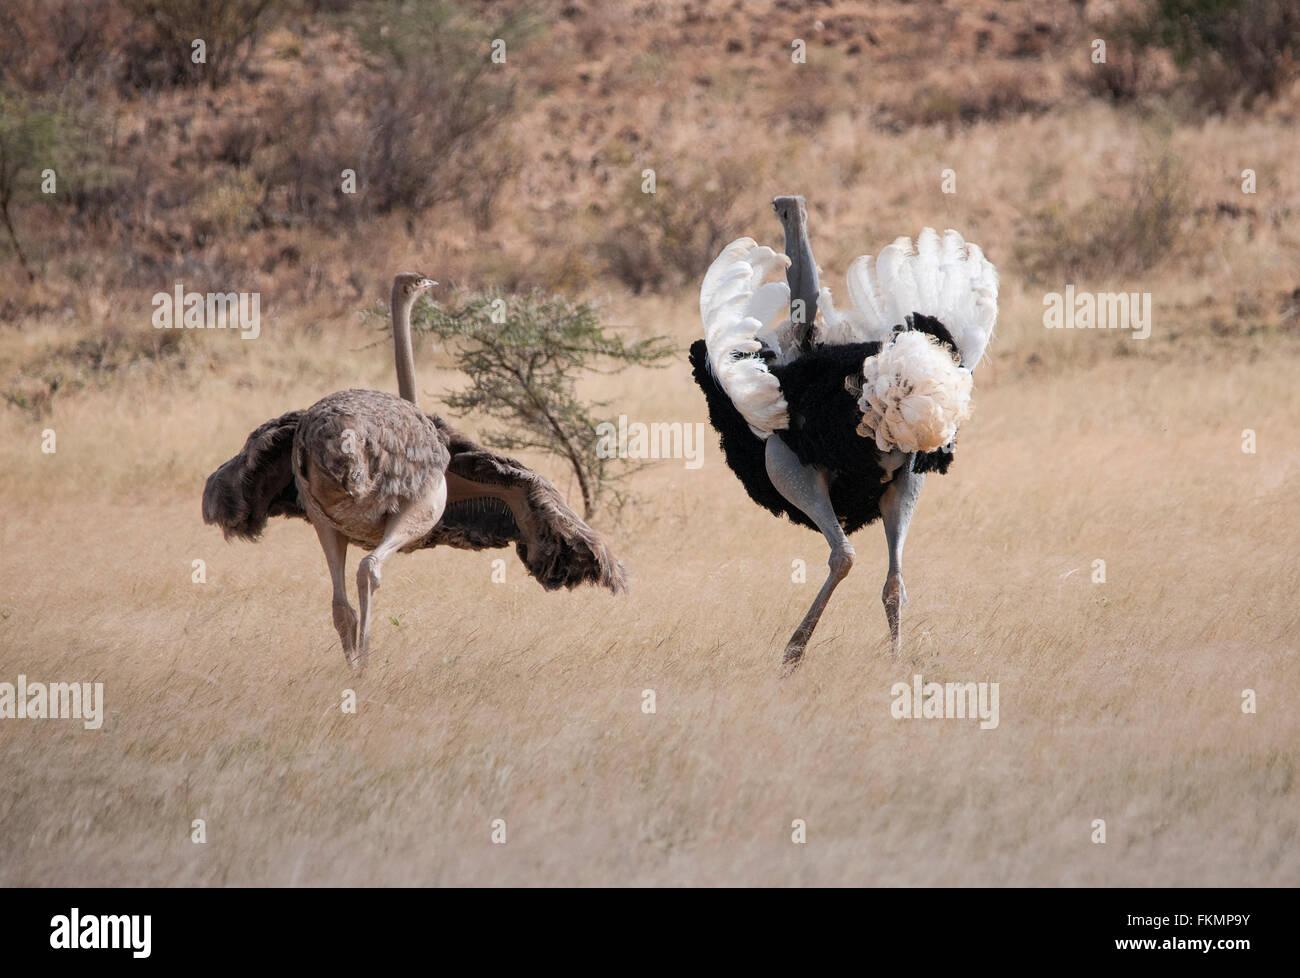 Male and Female Somali Ostrich (Struthio camelus molybdophanes) displaying courtship behaviour, Samburu, Kenya, - Stock Image